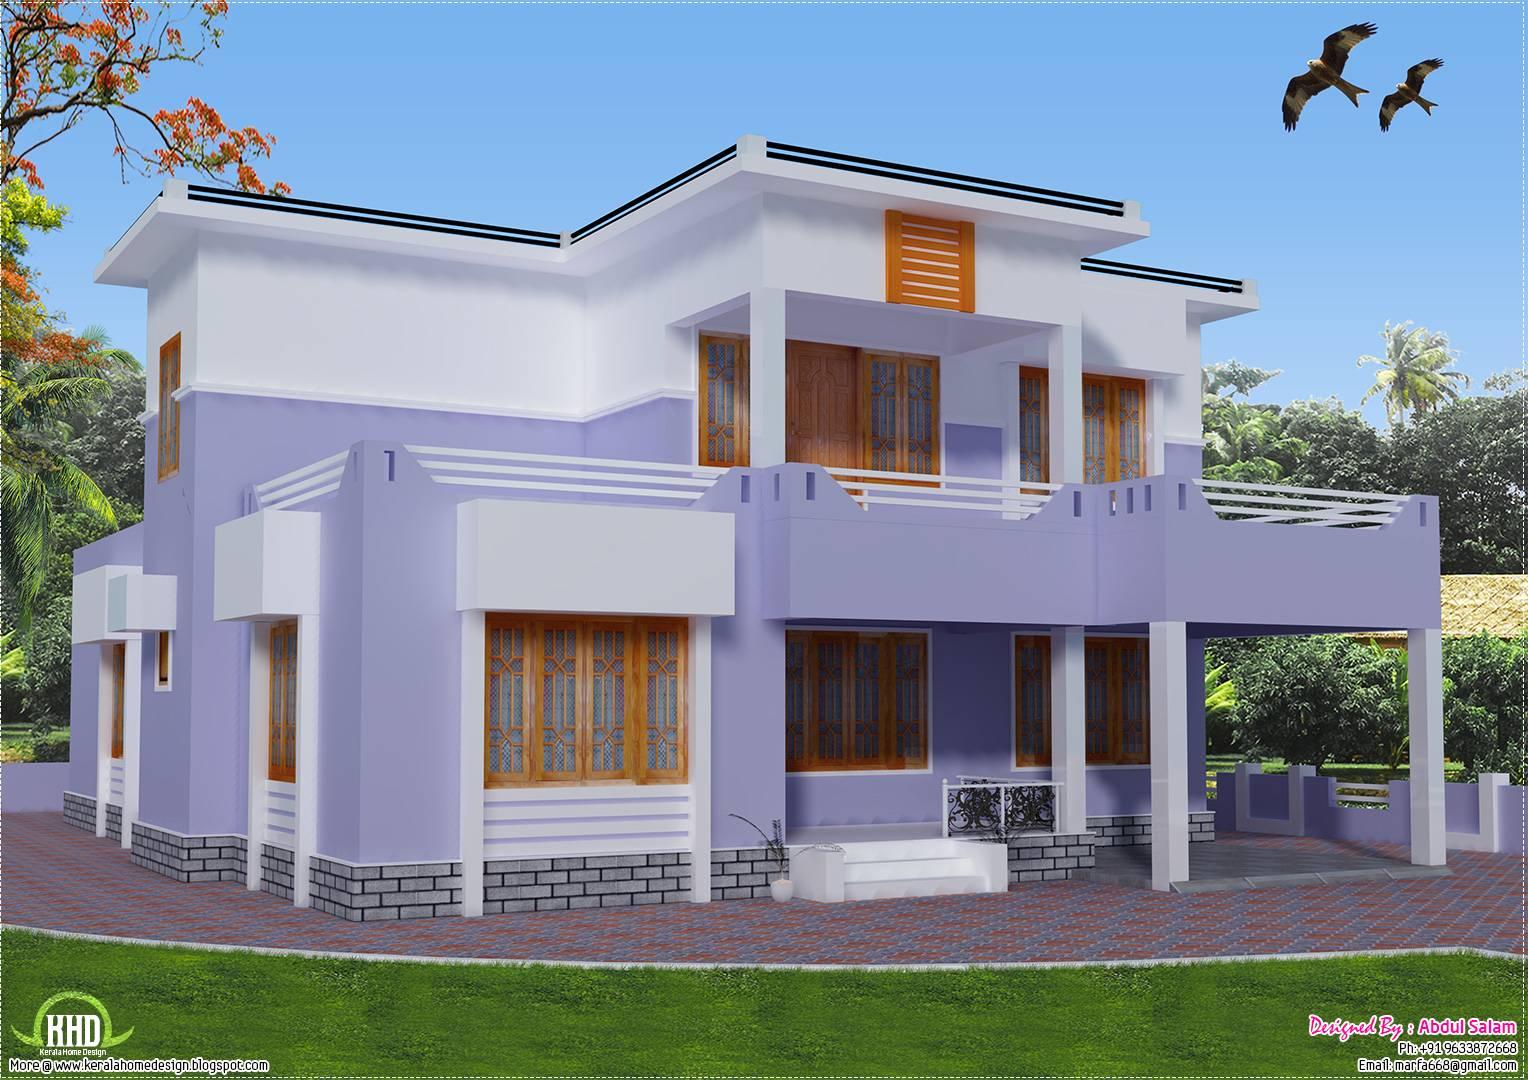 Feet Flat Roof House Design Kerala Home Floor Plans House Plans 77867